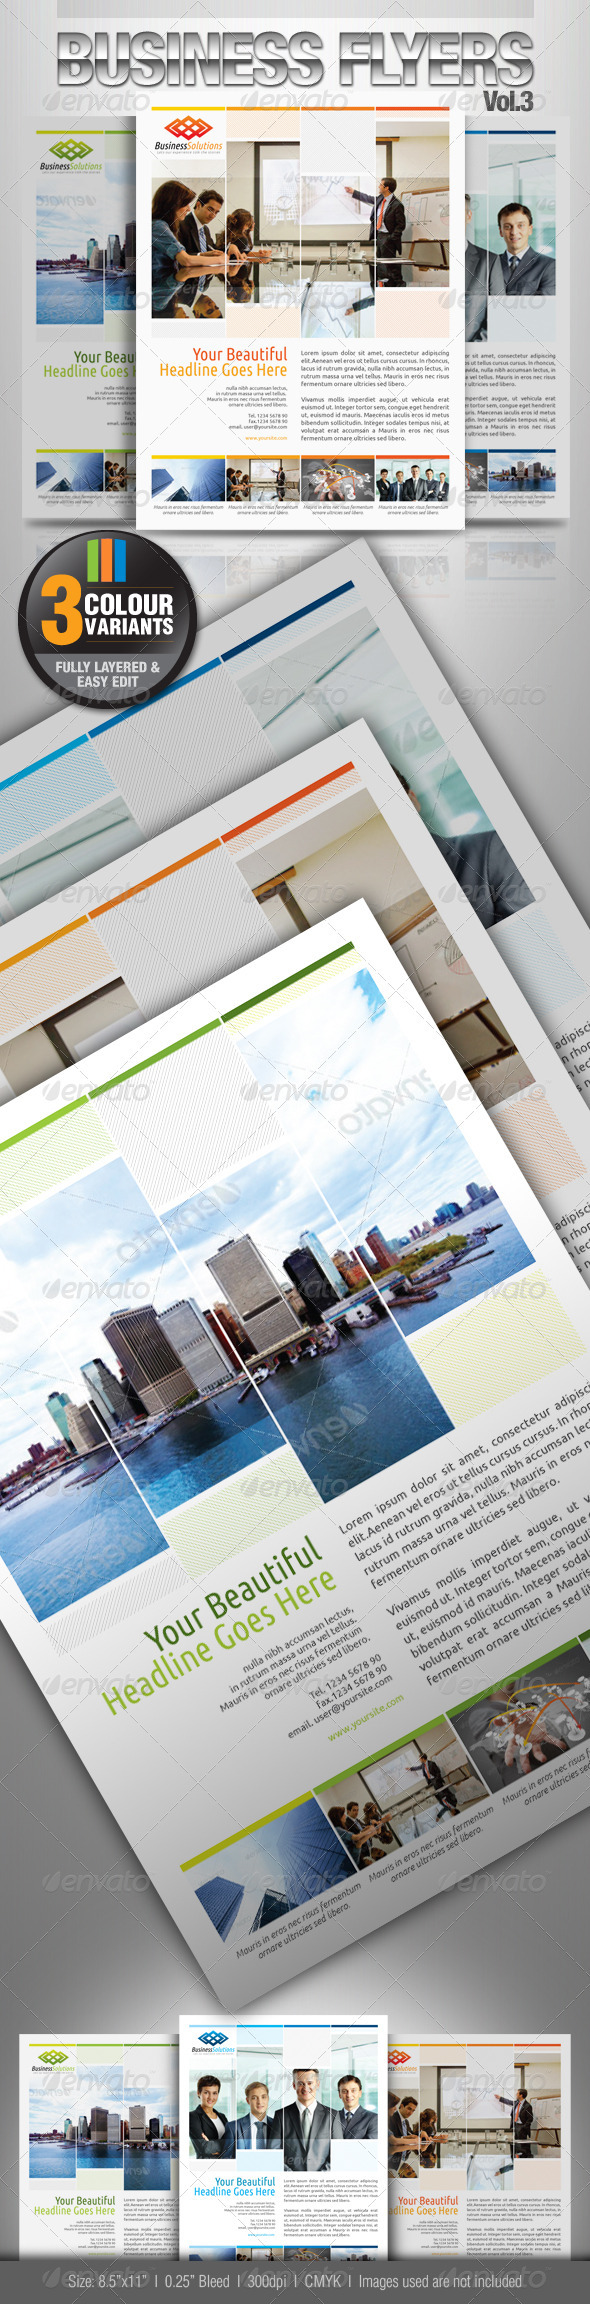 GraphicRiver Simple & Clean Corporate Flyer Vol.4 2667266